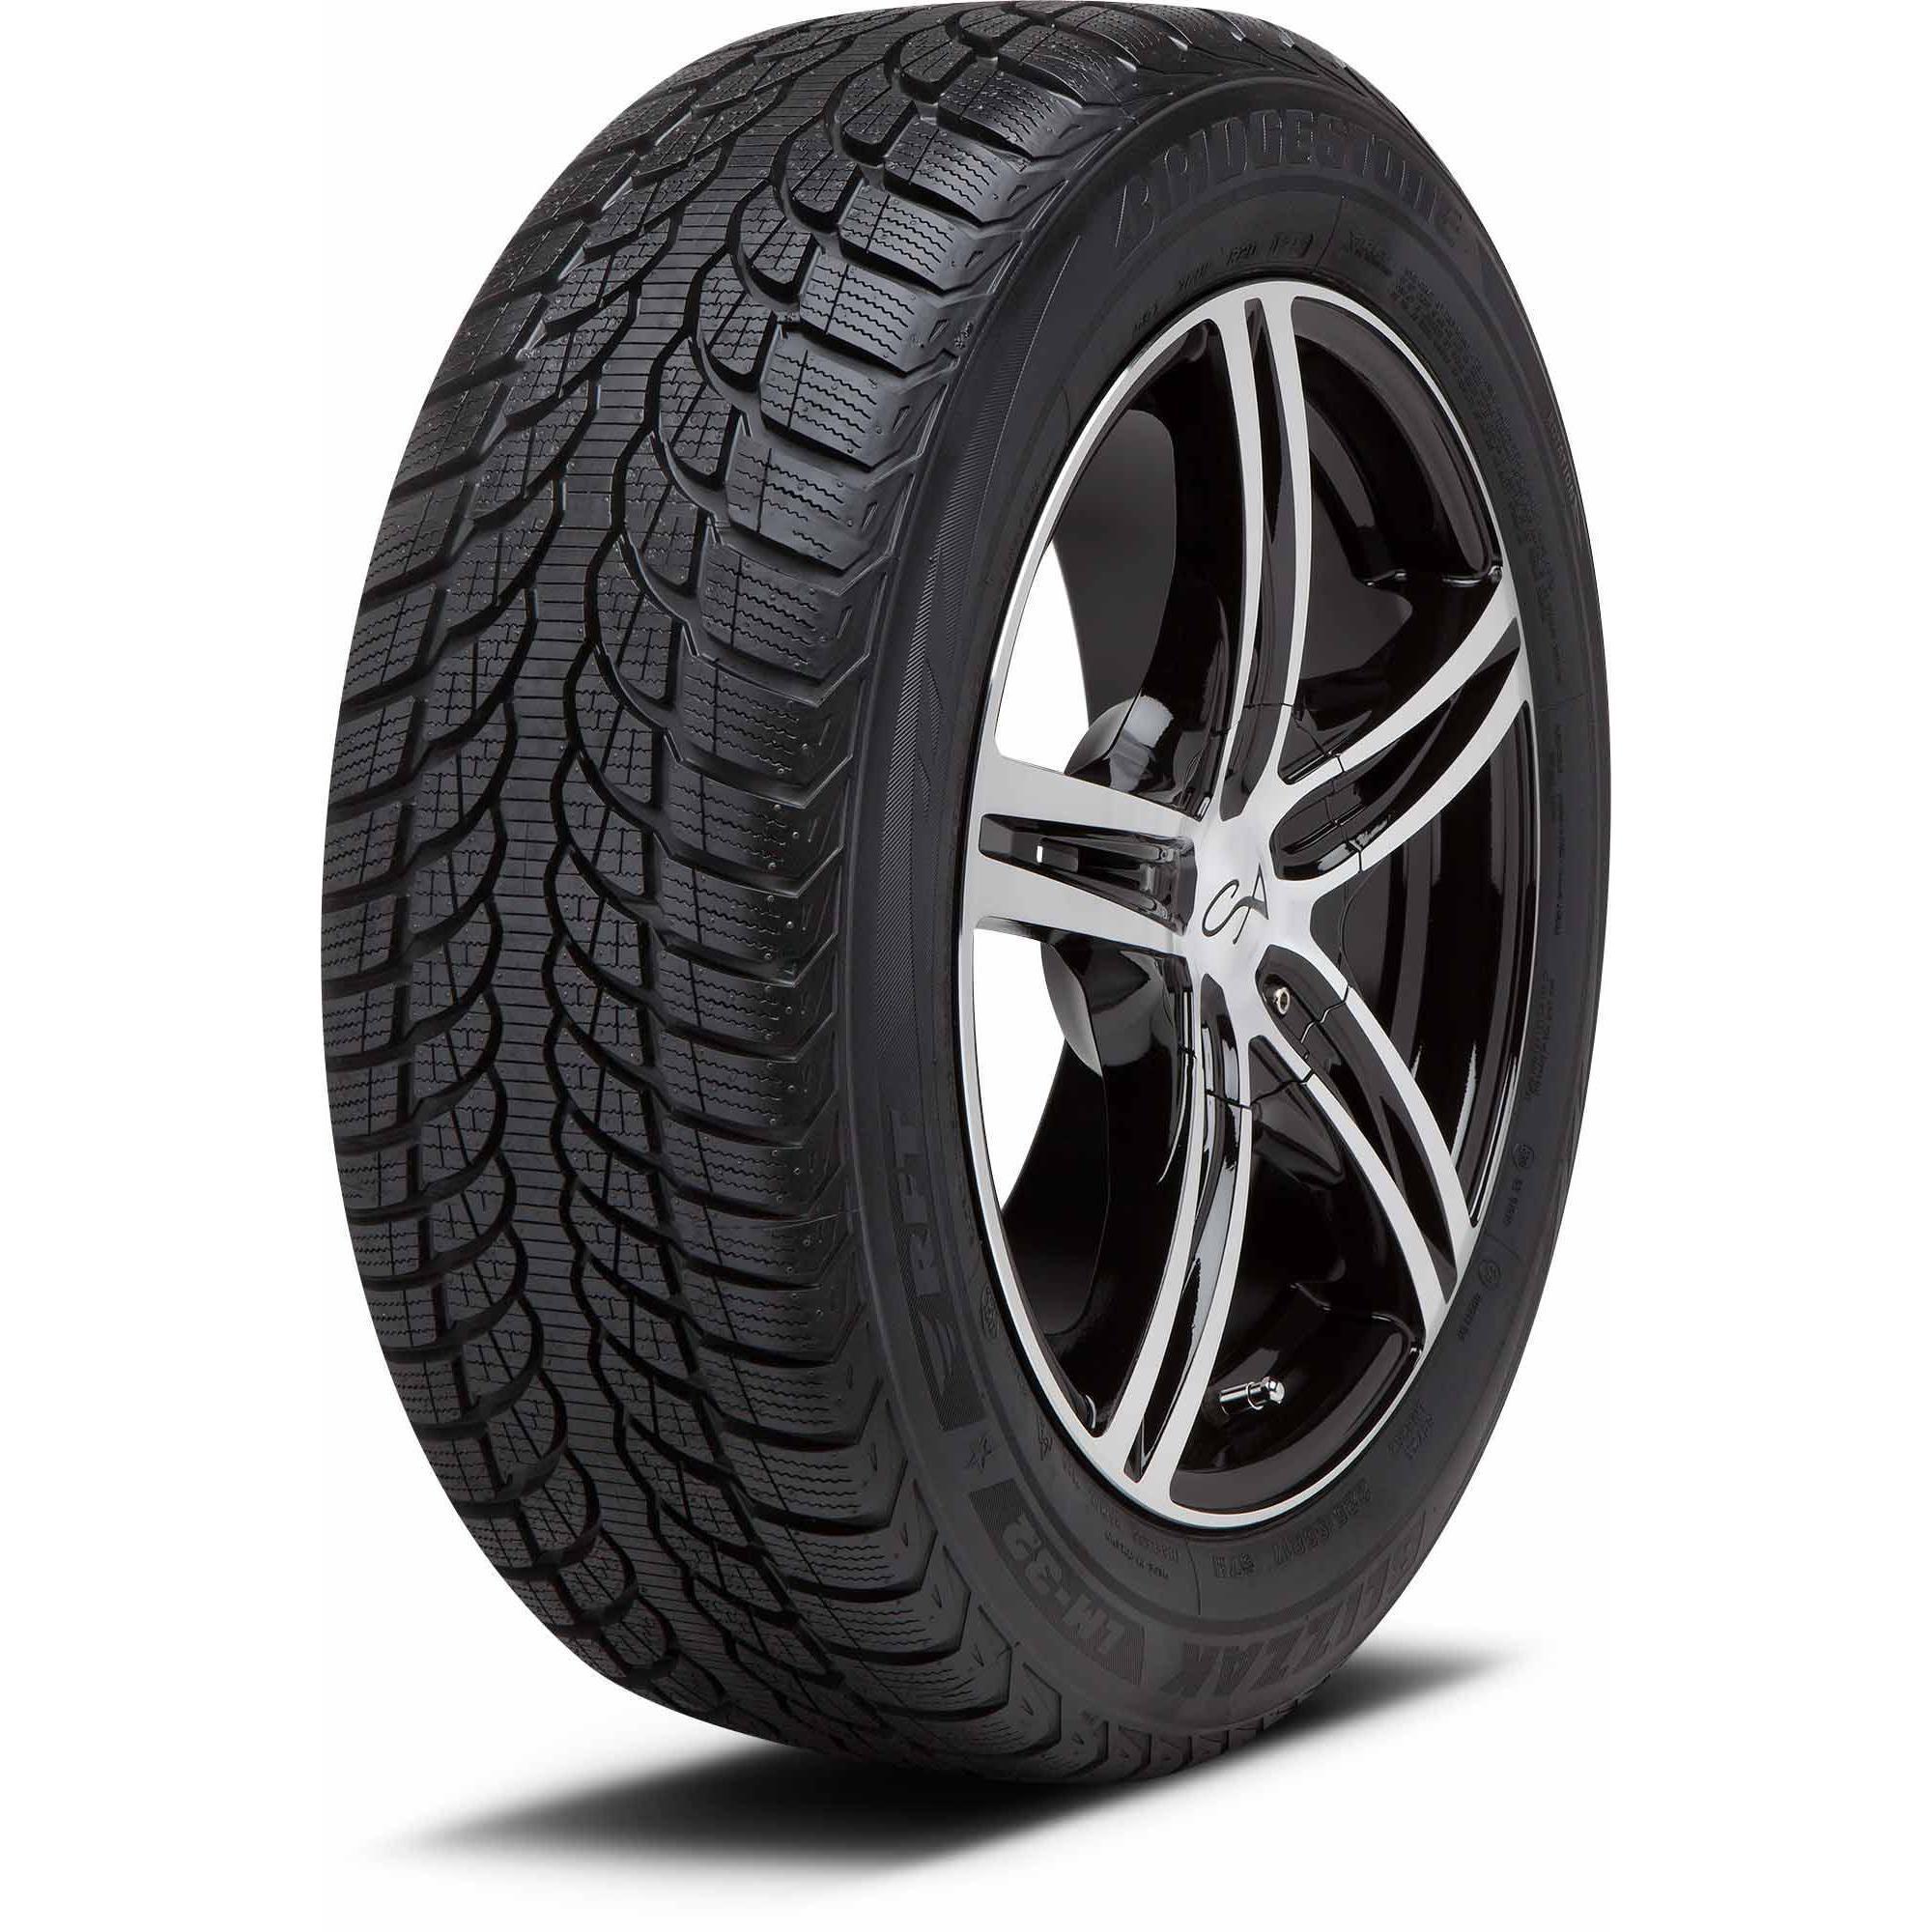 Tire Sizes: Bridgestone Tire Sizes